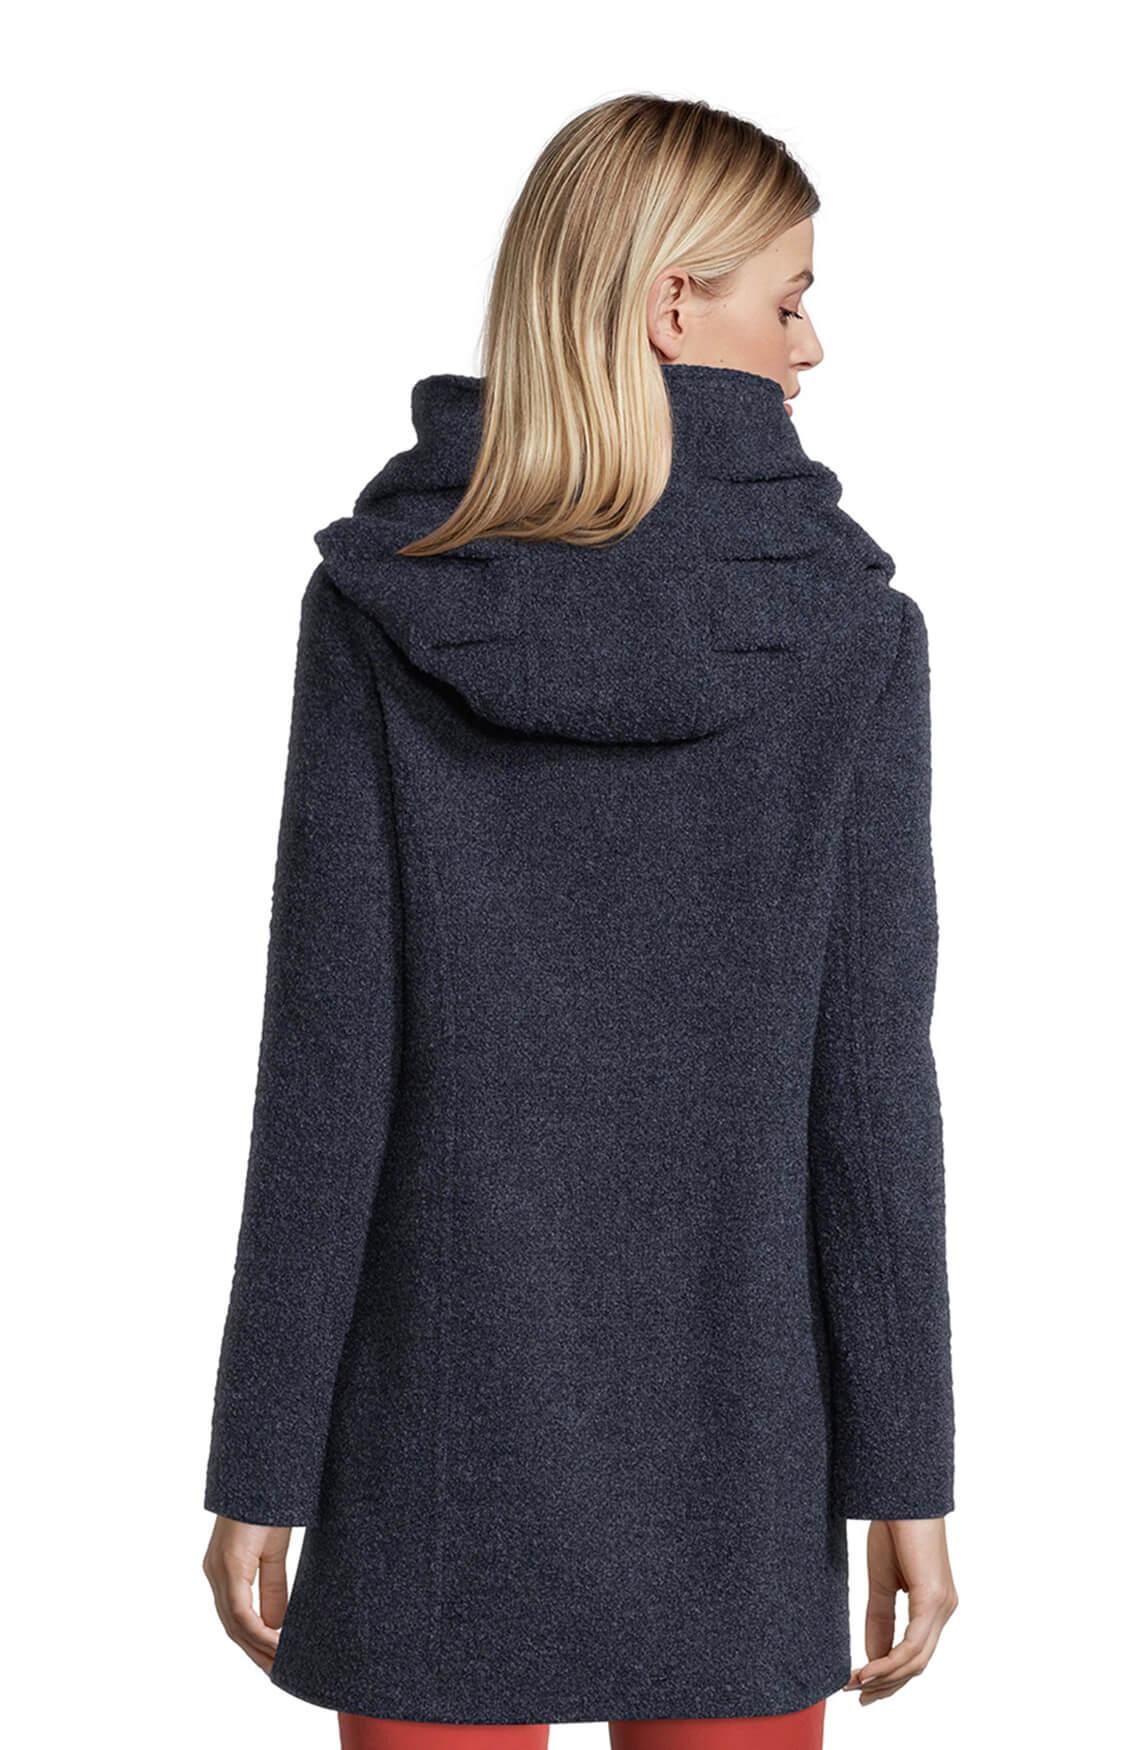 Gil Bret Dames Boucle jas met capuchon Blauw